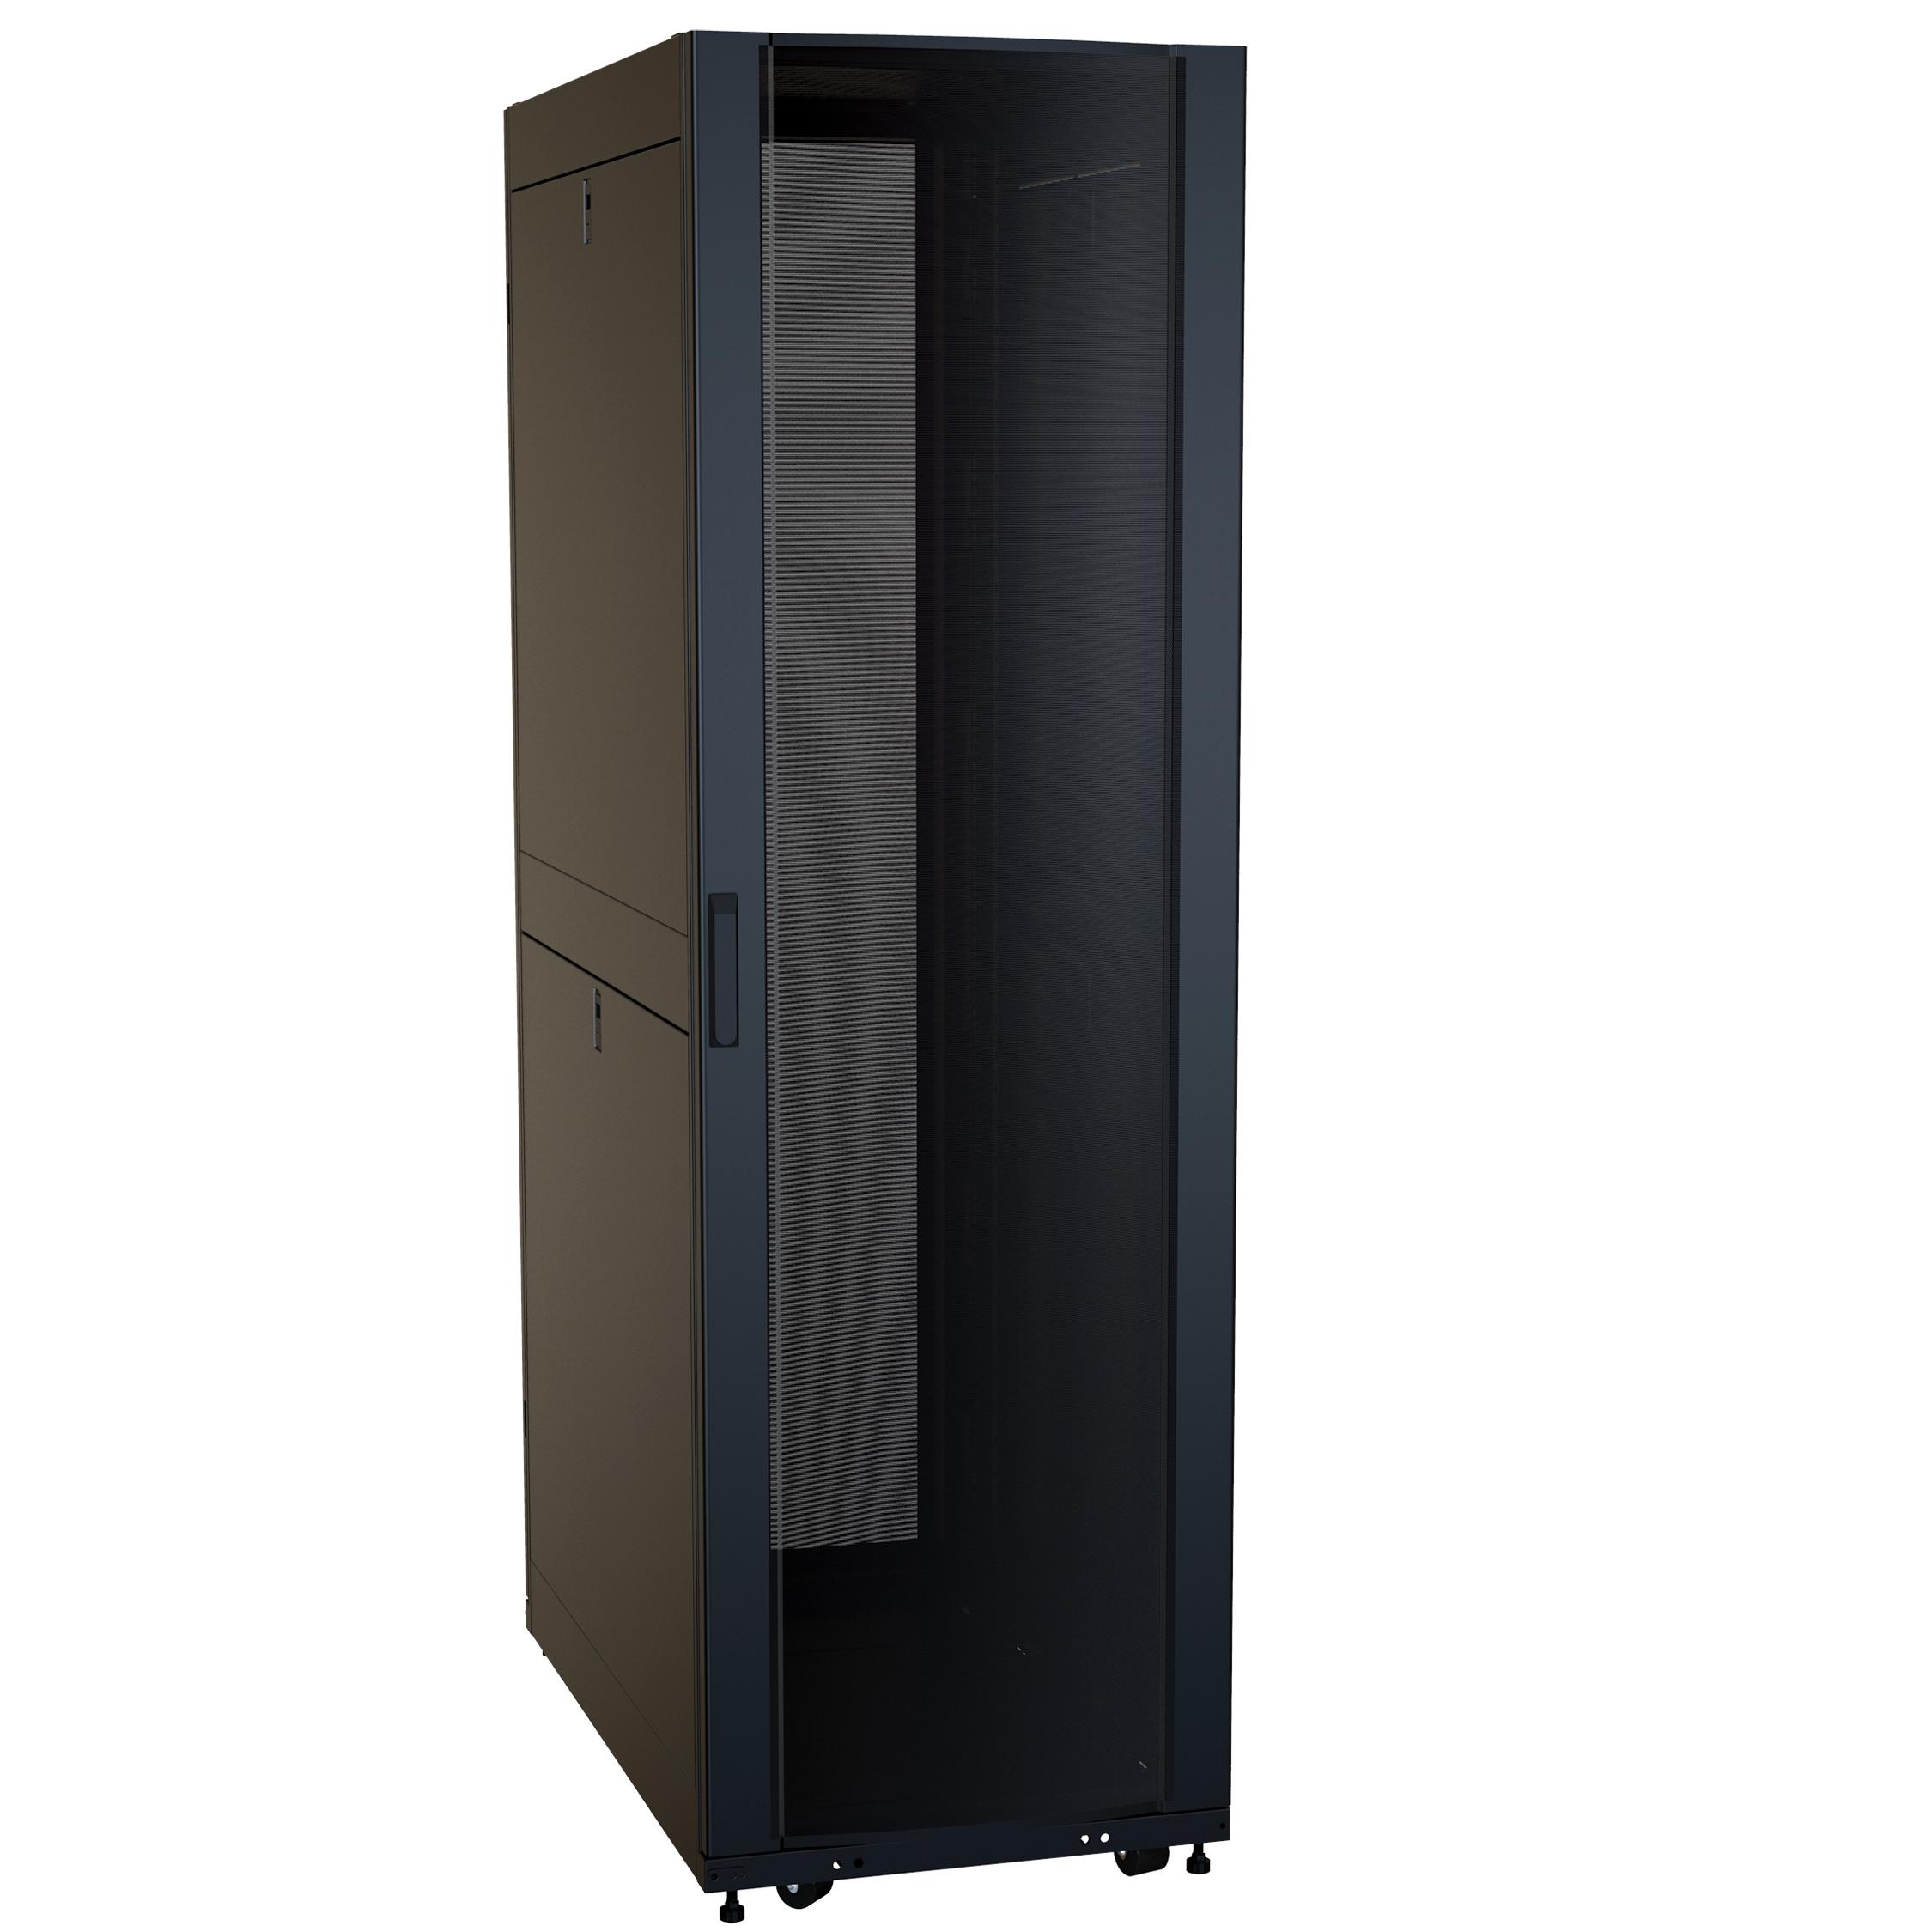 Economy Server Cabinet RB-DC Series